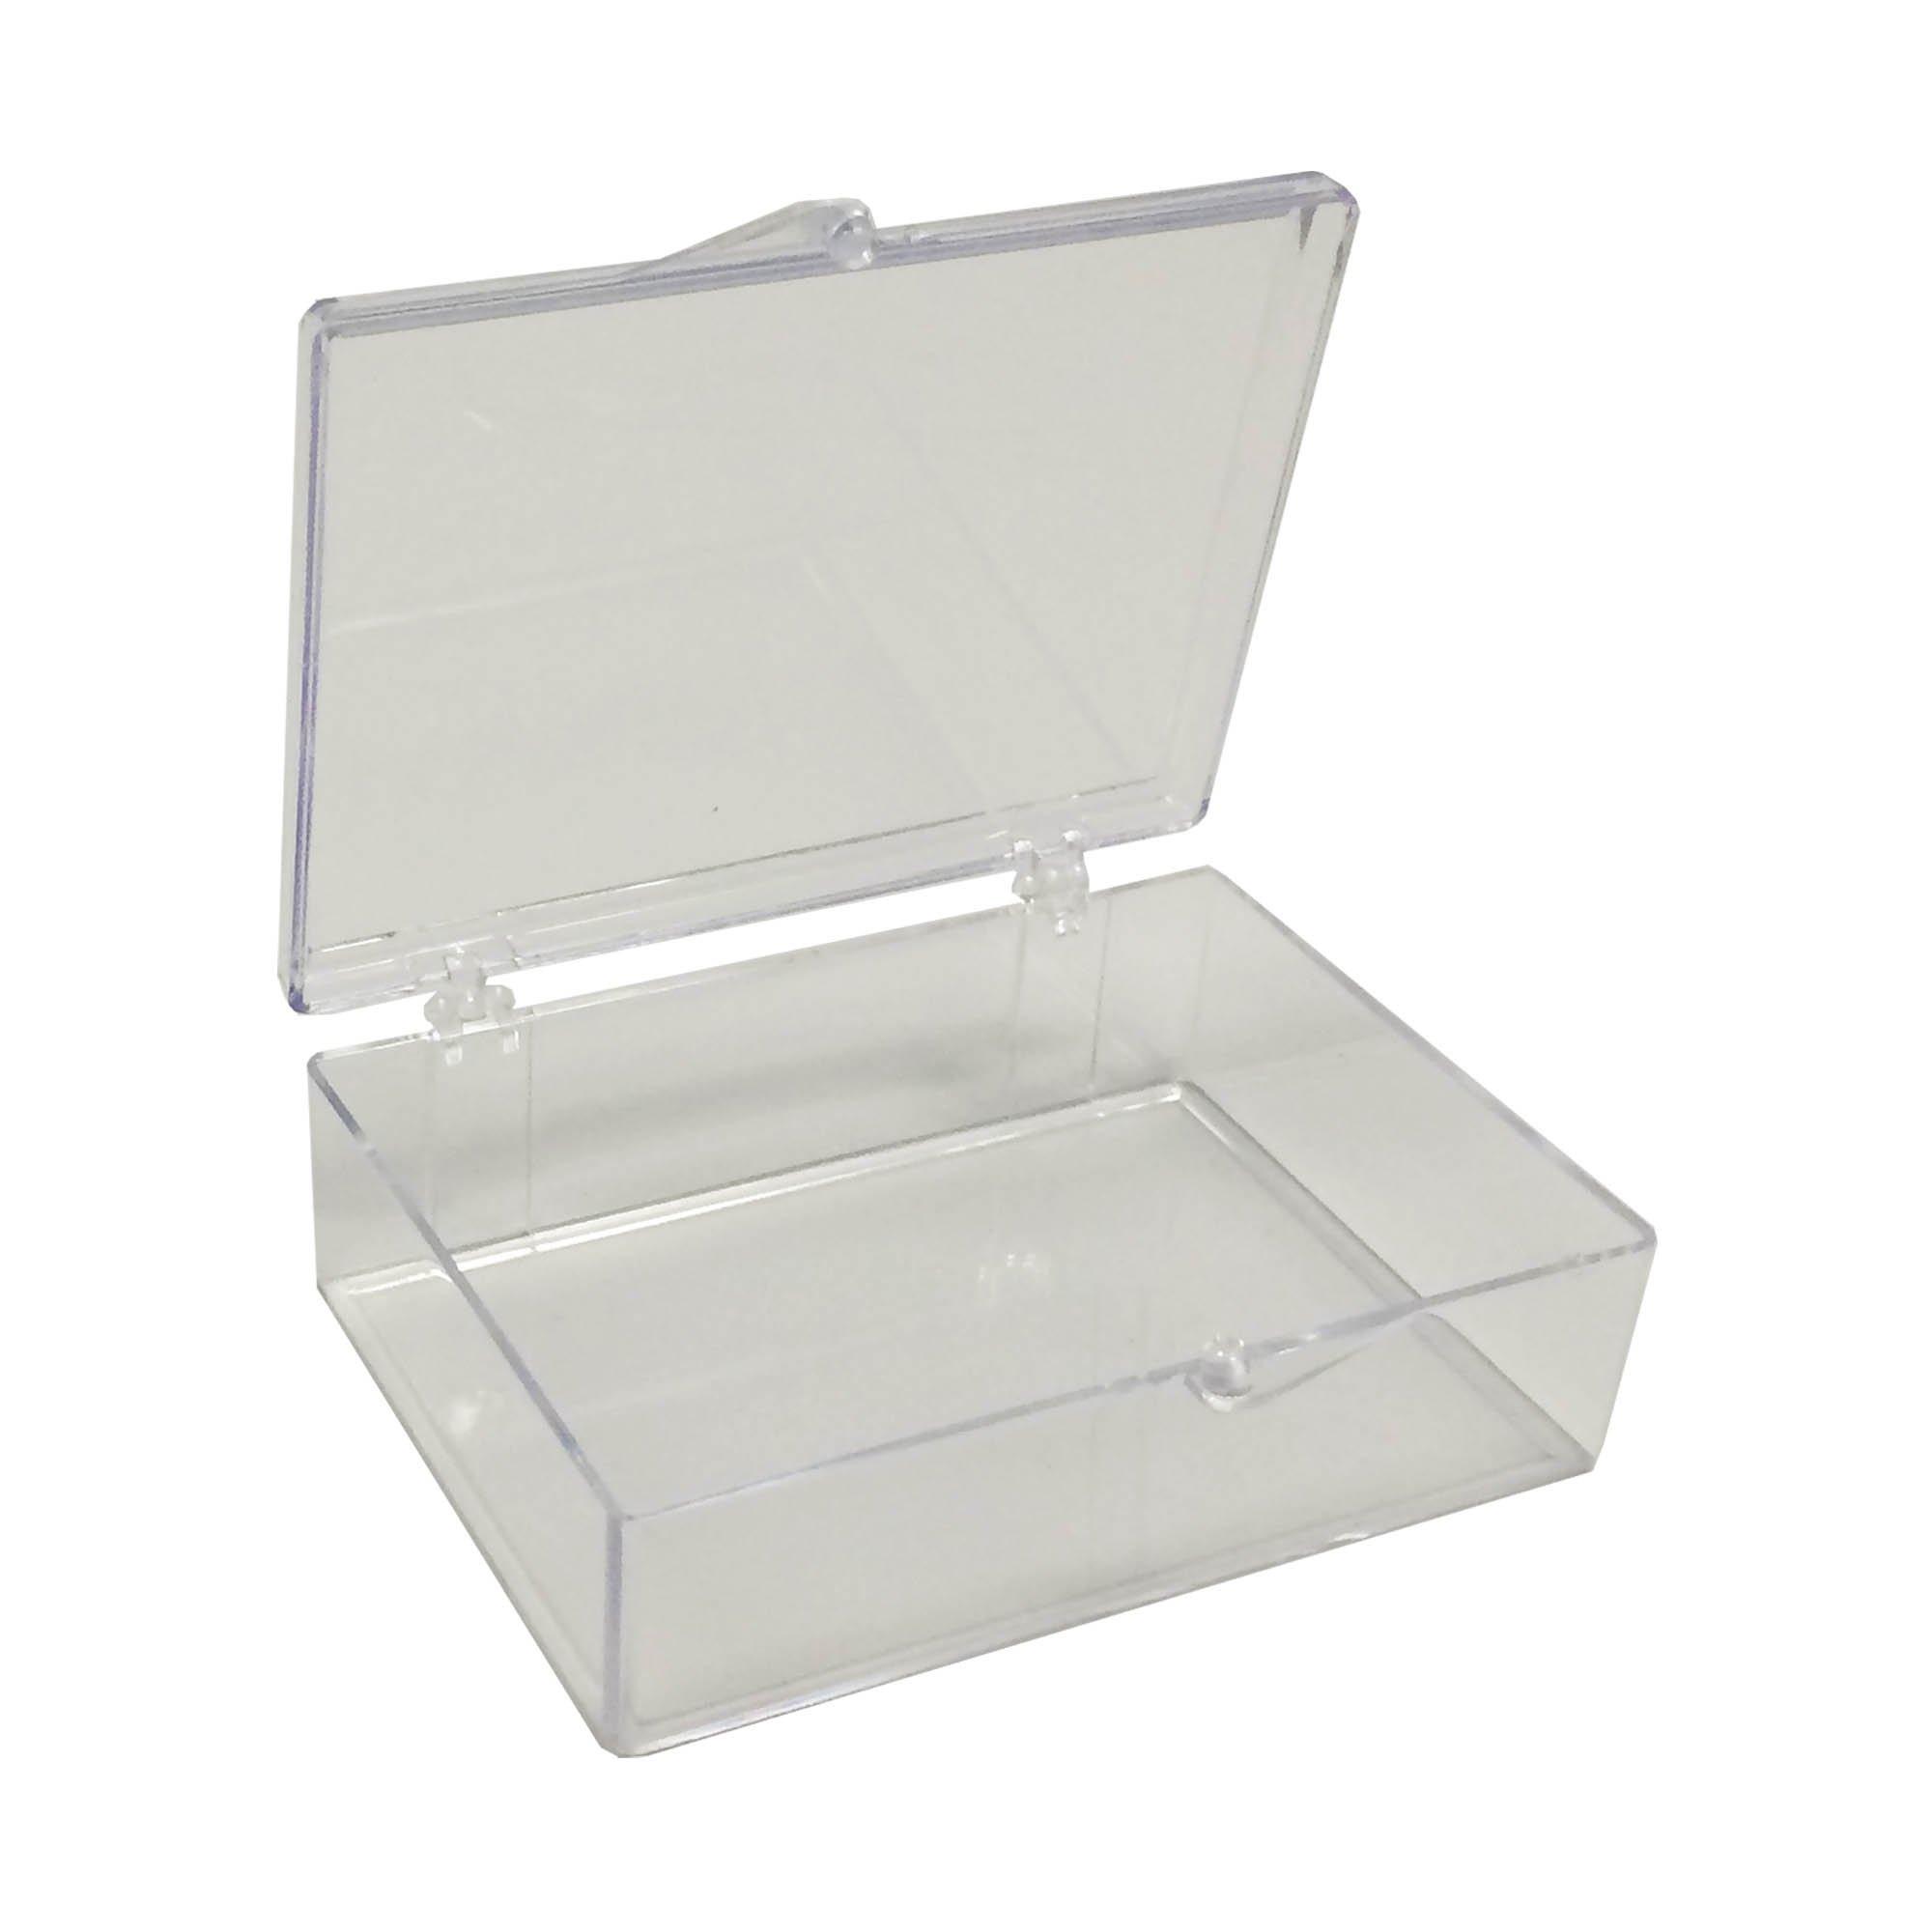 Medium Rectangle Clear Western Blot Box - 3 1/2